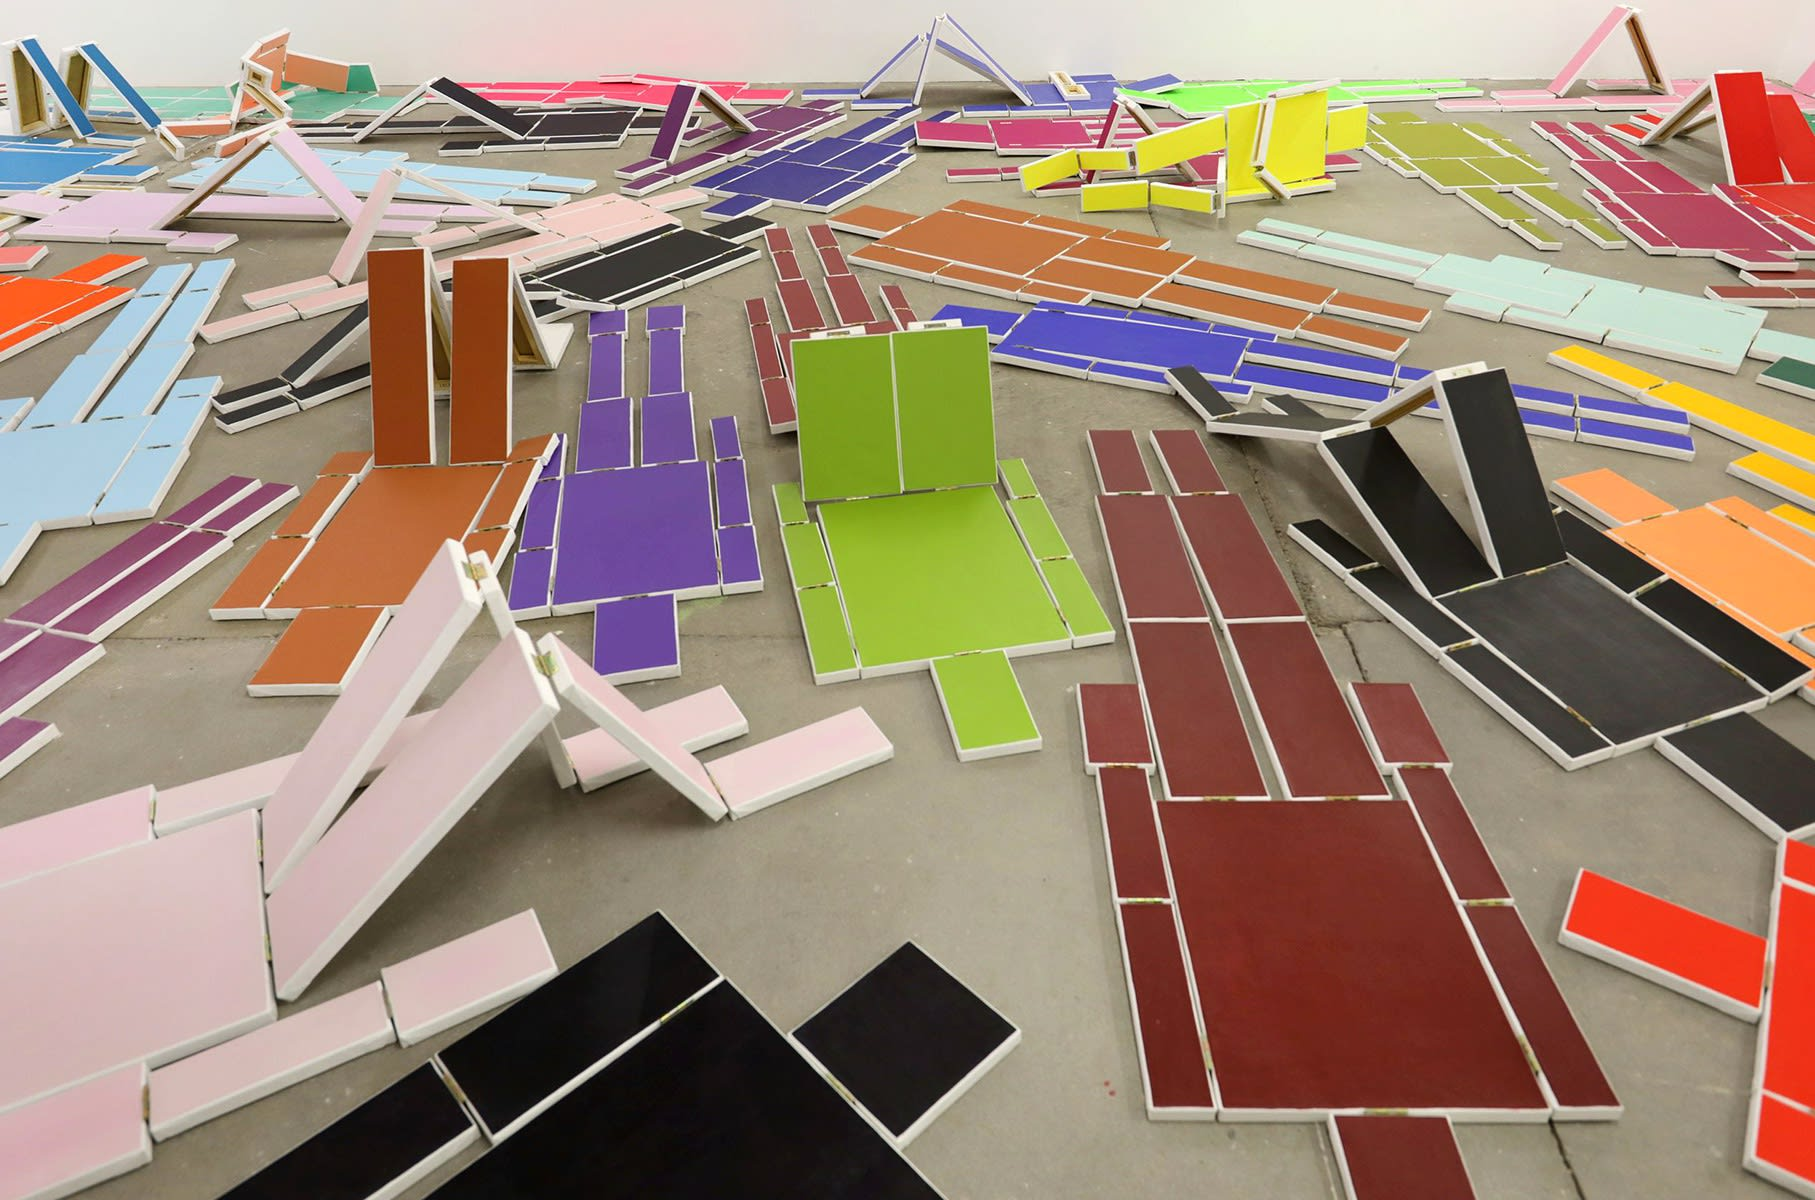 kw institute for contemporary art, berlin biennale,